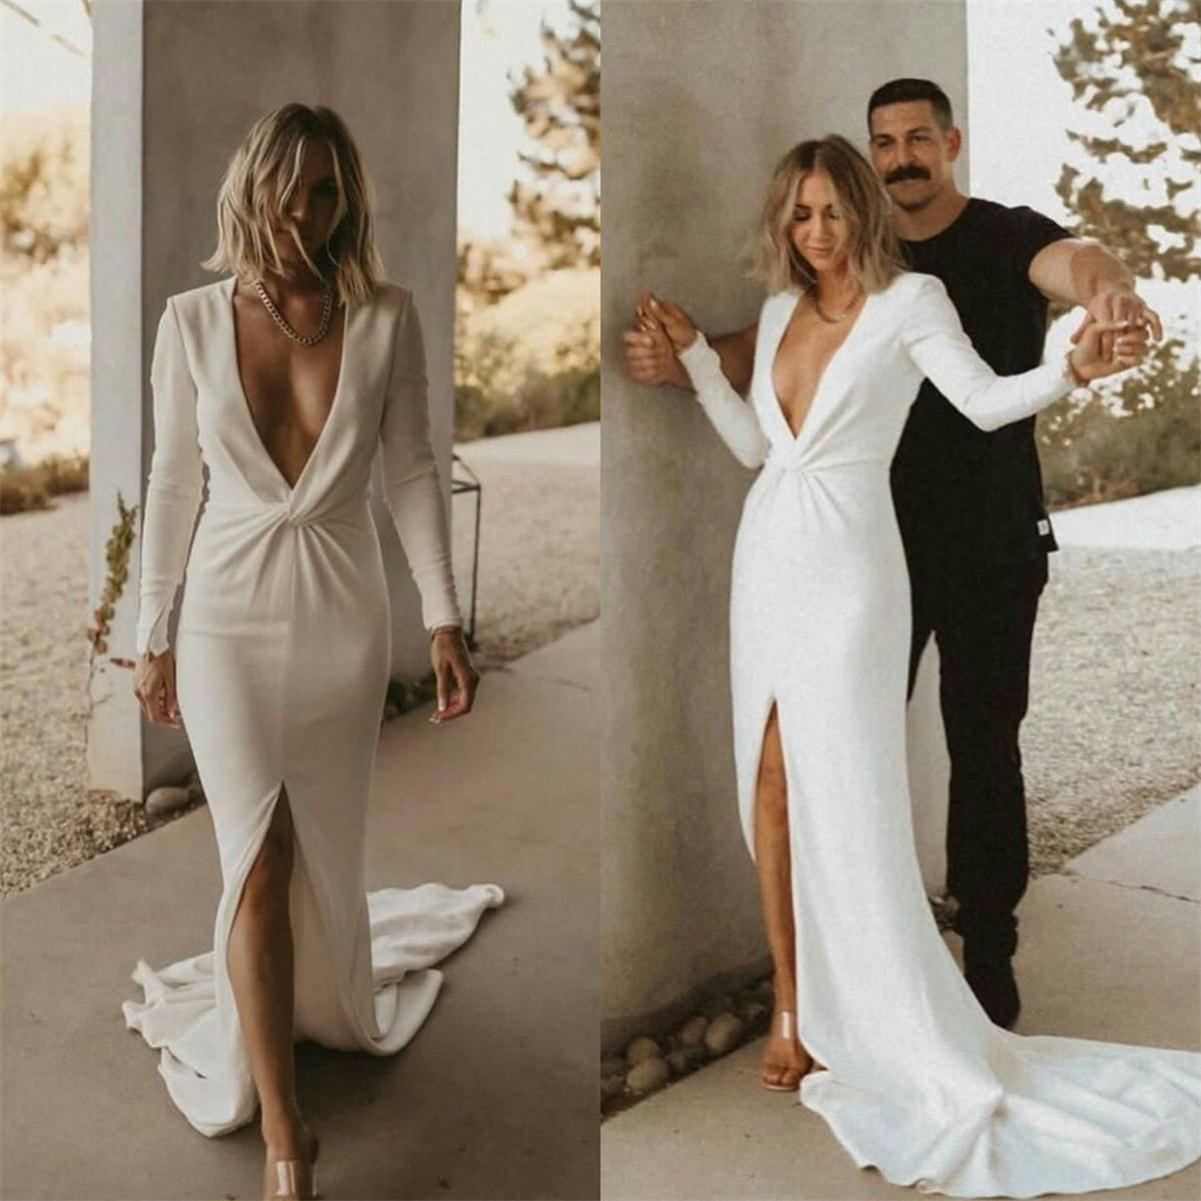 Deep V Neck Mermaid Wedding Dresses 2021 Satin Long Sleeves Front Slit Bridal Gowns Sexy Robe De Mariee